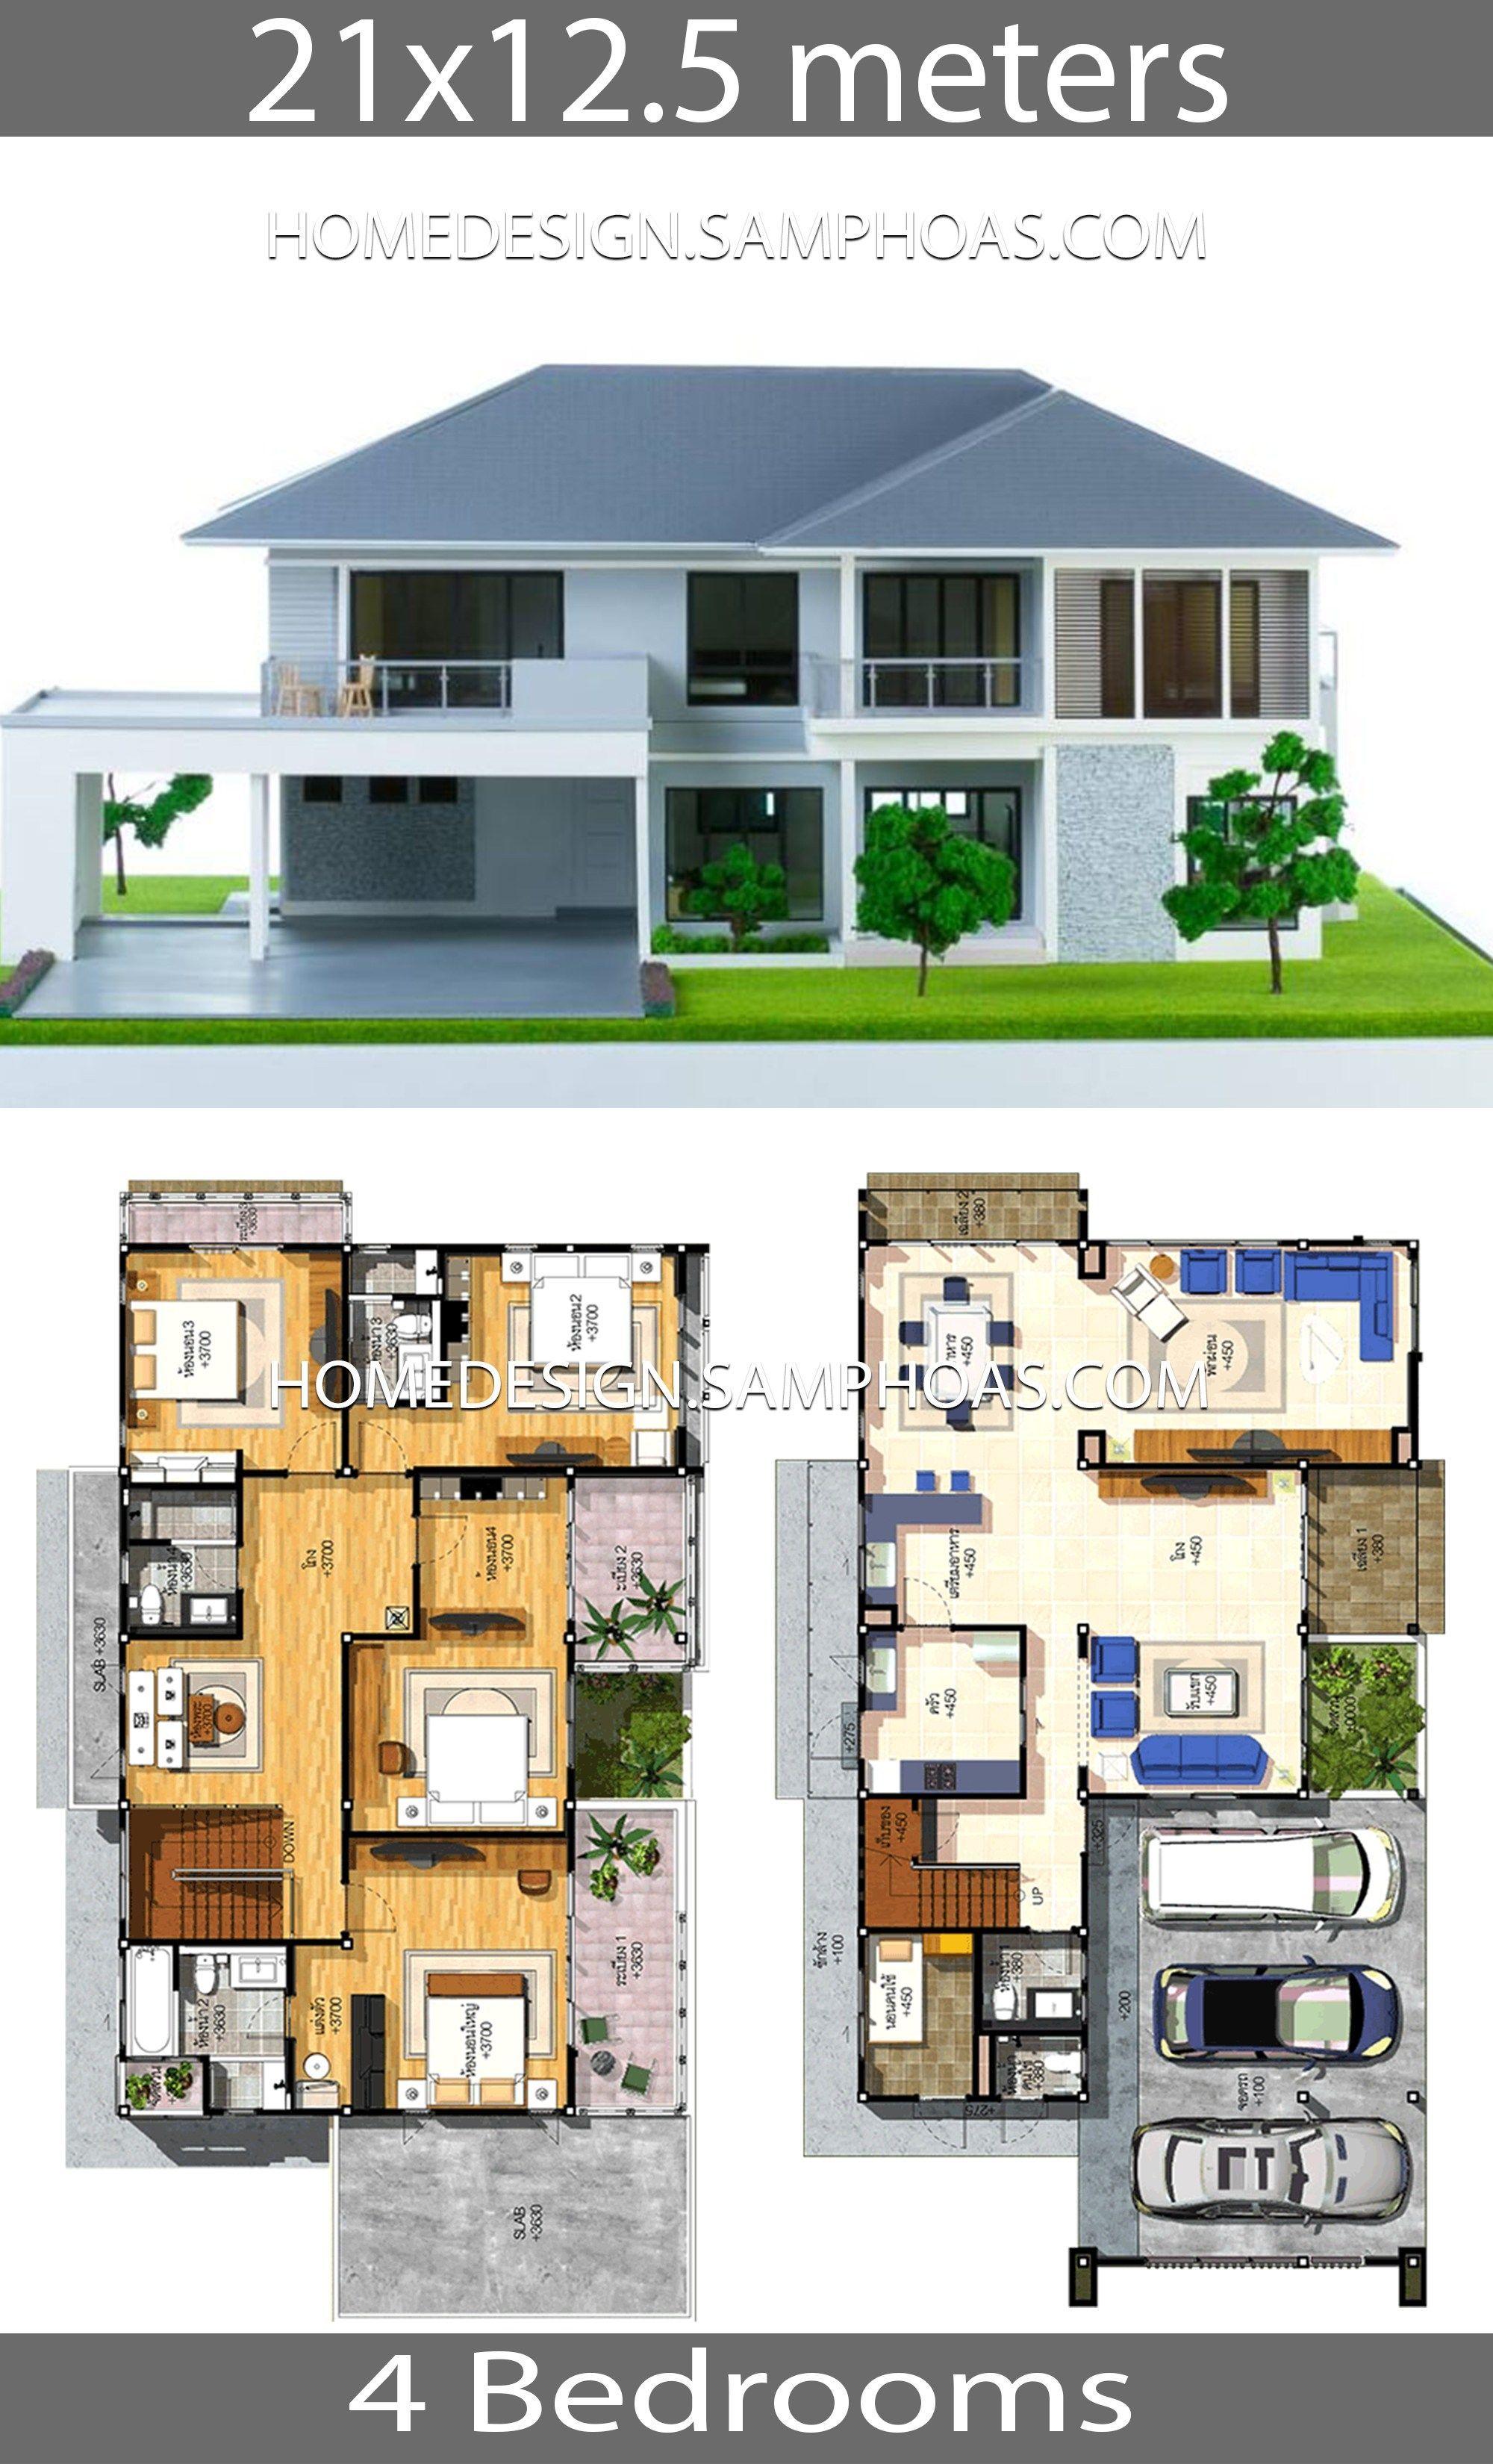 House Plans Idea 21x12 5 With 4 Bedrooms Home Ideas Ajay Dookhy House Plans Idea 21 12 5 With 4 In 2020 Fantasy House Dream House Plans House Architecture Design